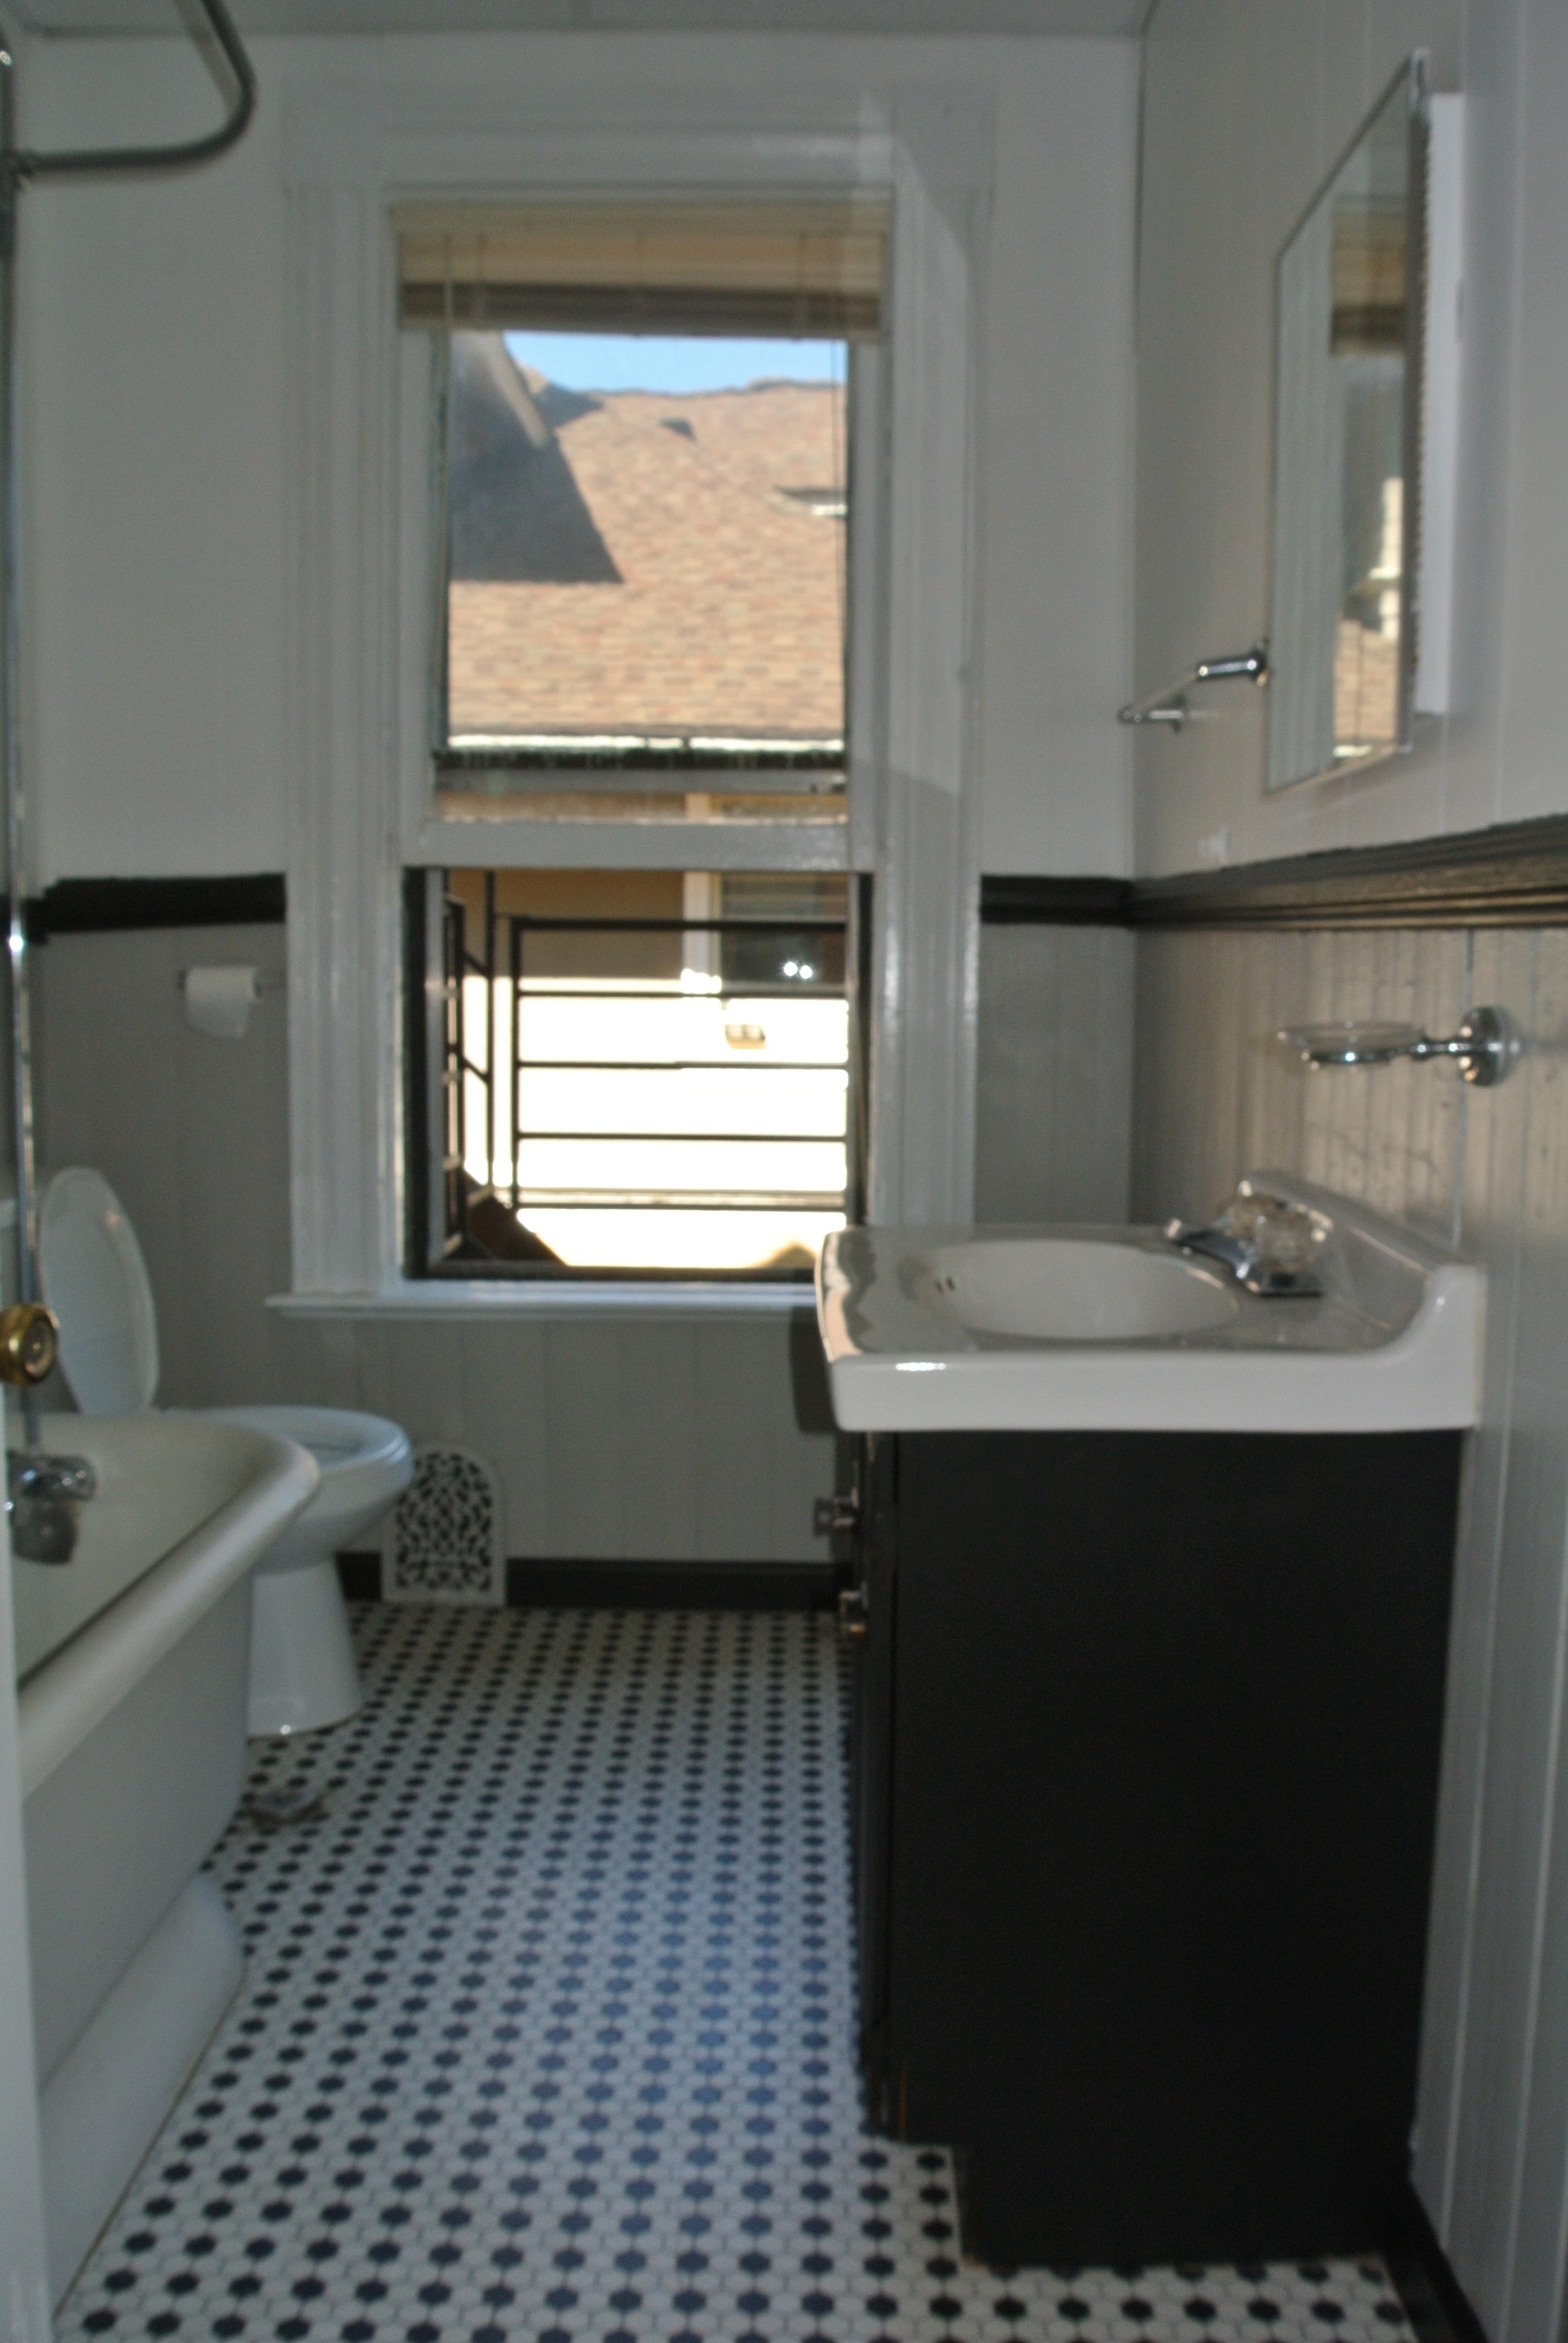 22StrathallanPk-Apt3-Bathroom2.jpg